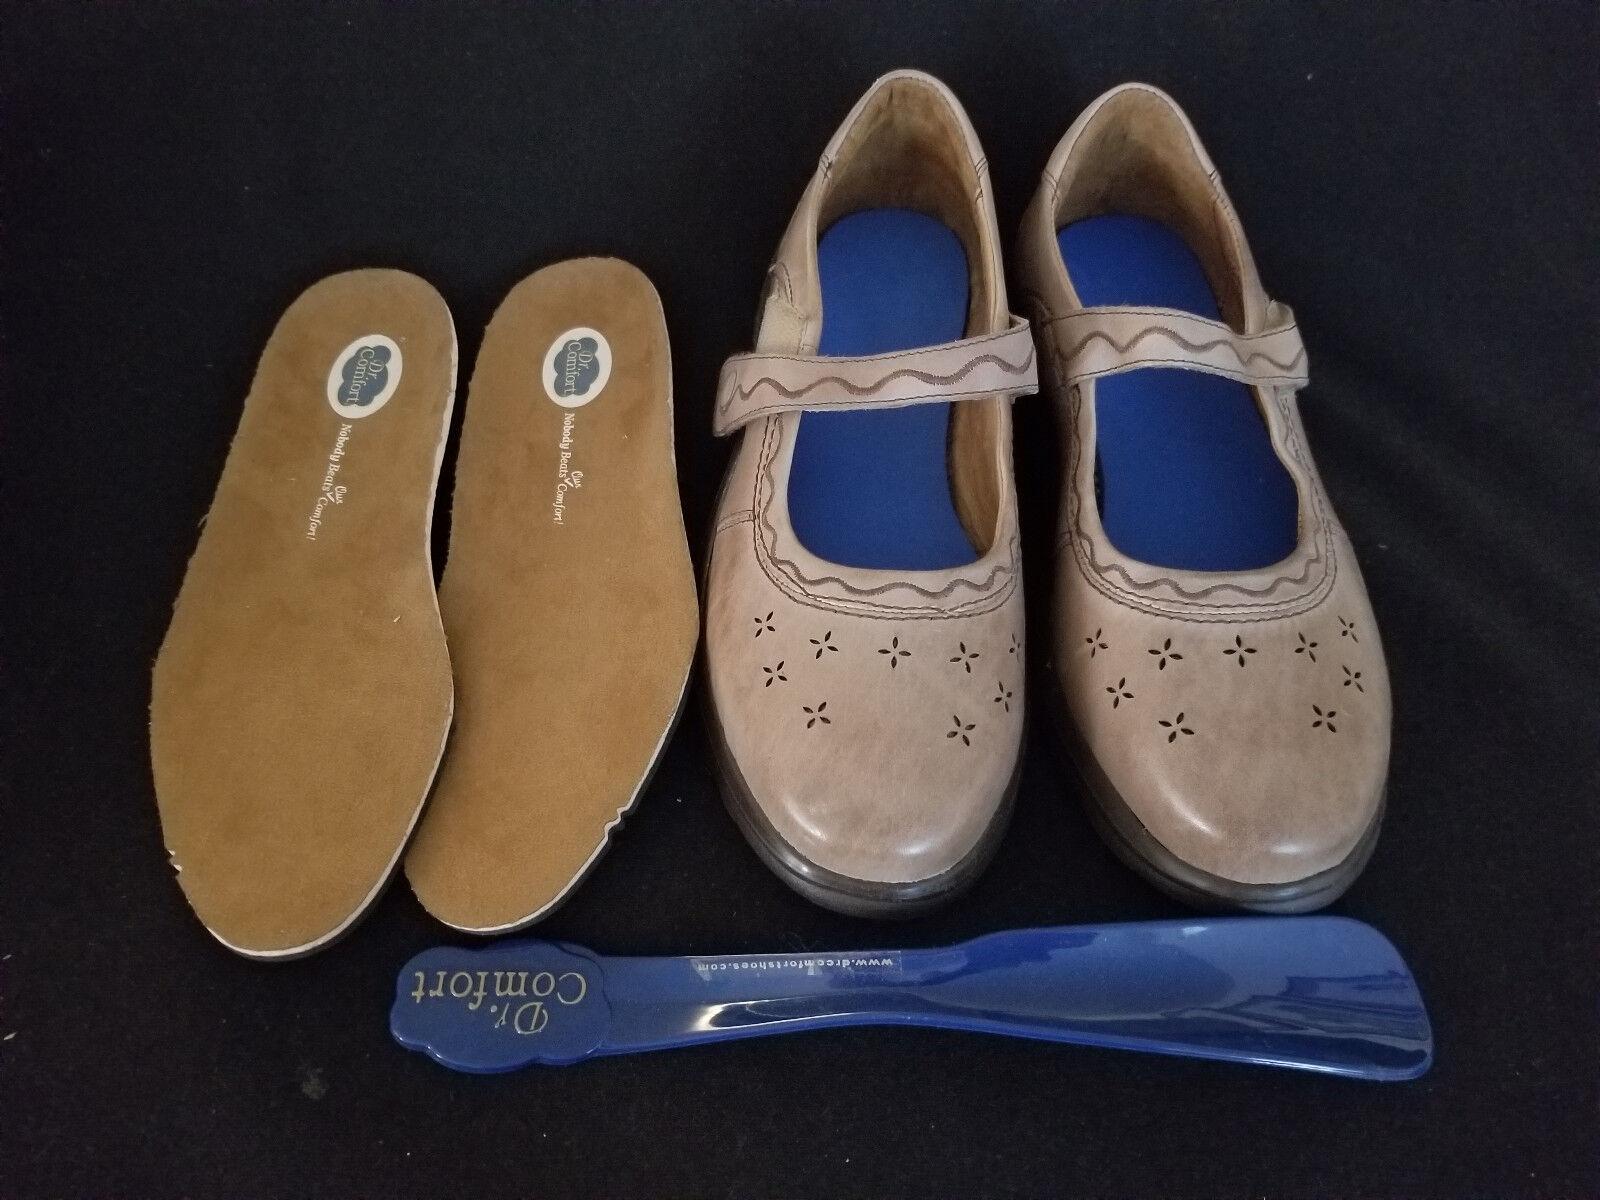 Dr. Comfort Wouomo scarpe Marronee 6W  2230 Sunshine New w Insoles, scarpe Horn & Box